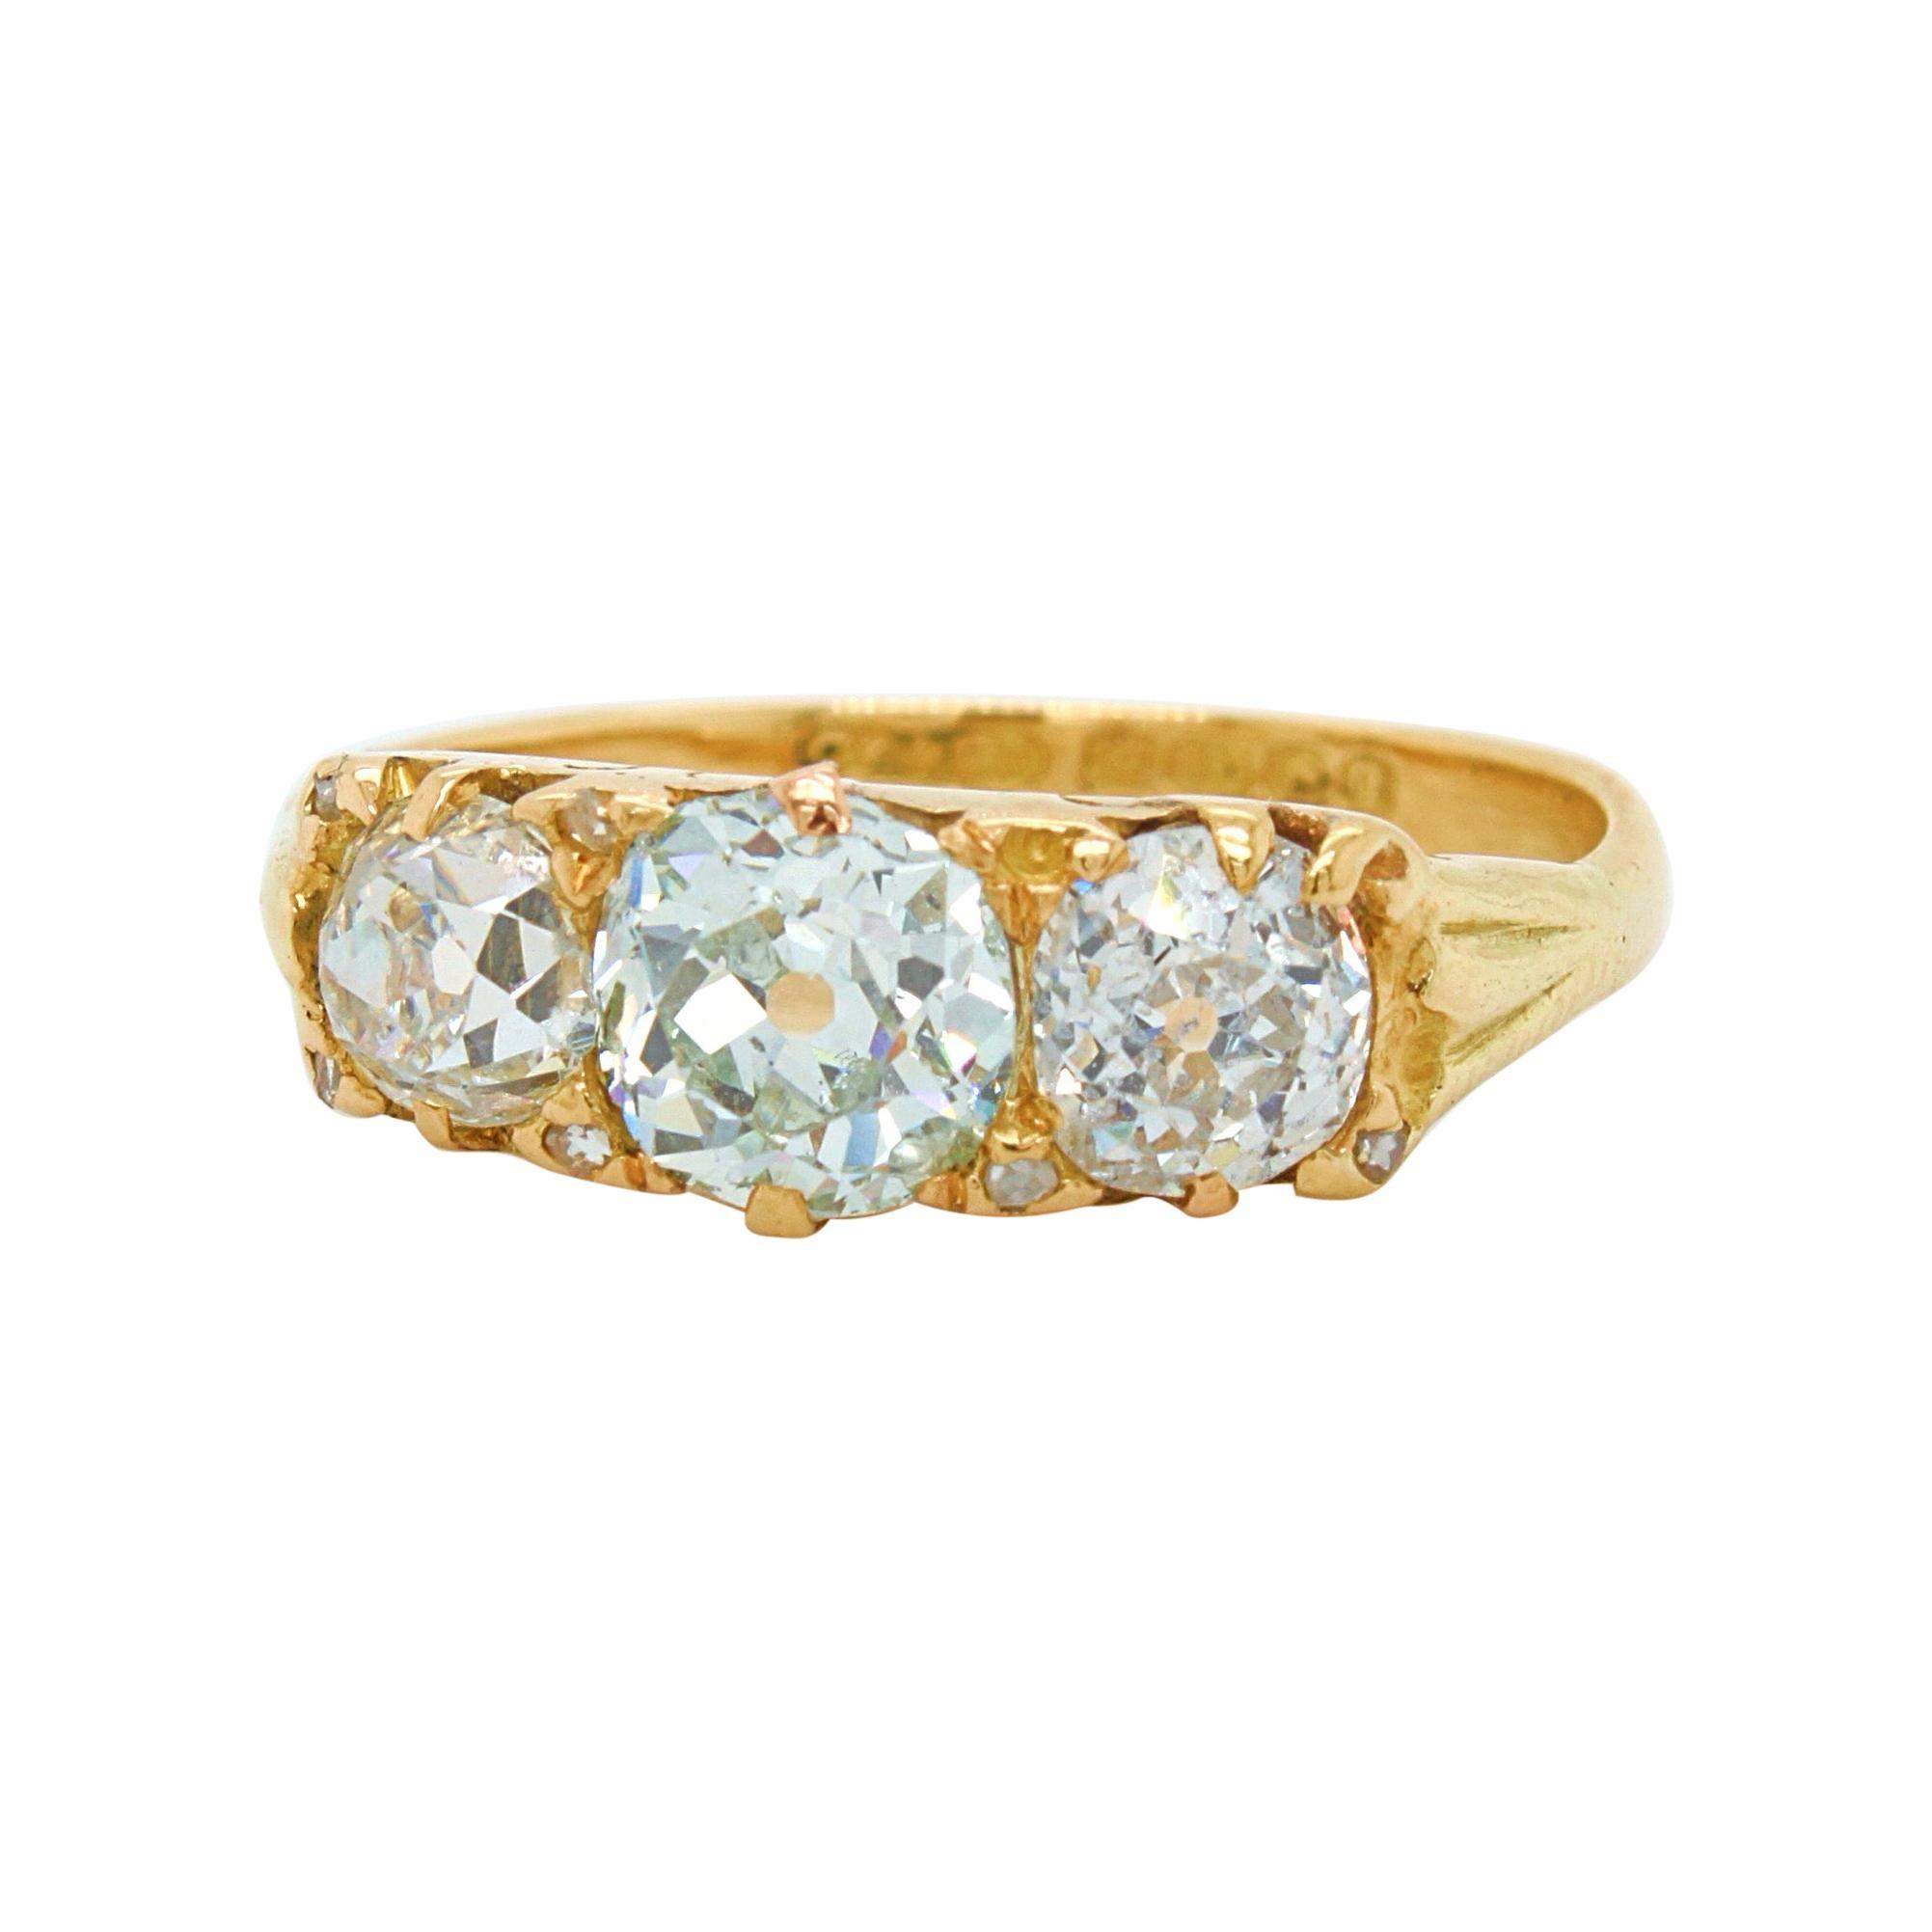 Victorian Very Light Green 'GIA' Old Cut Three Diamond Ring, ca. 1880s